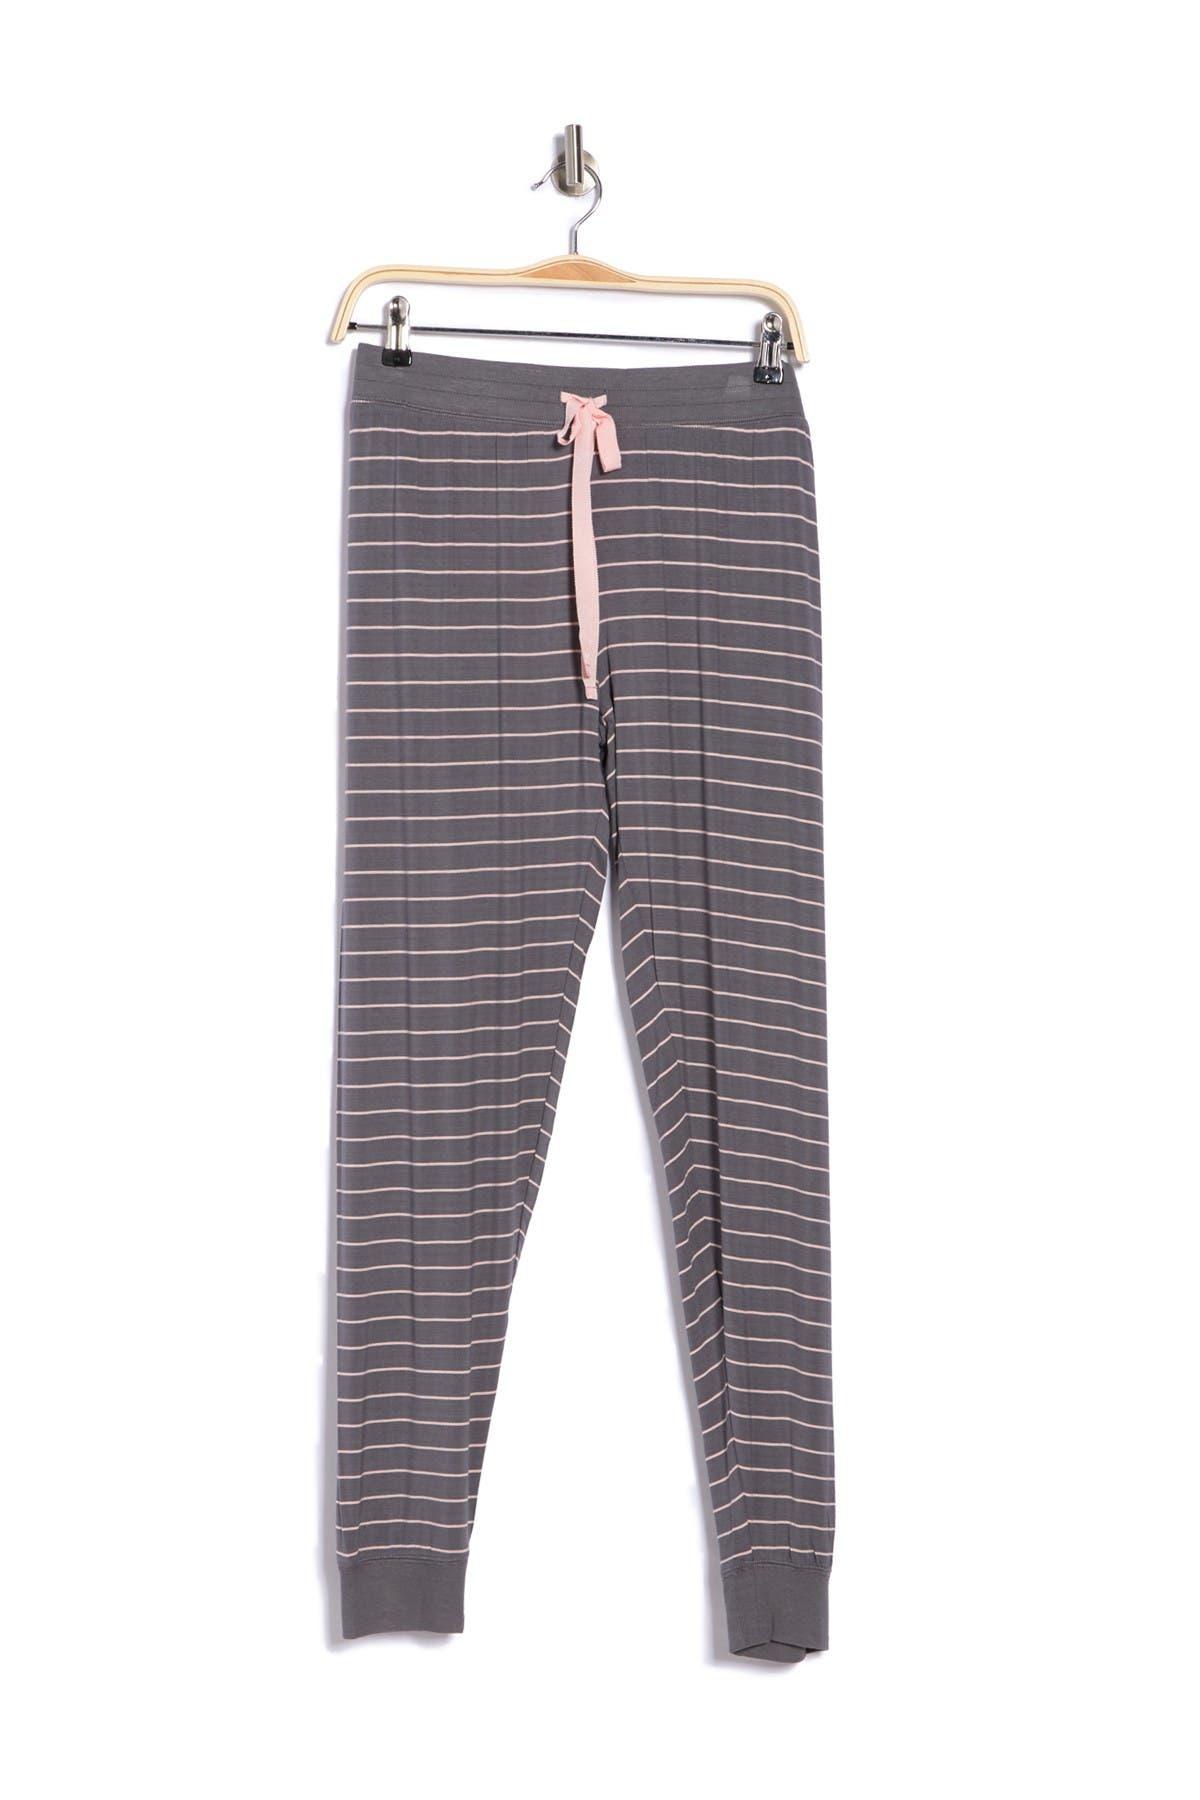 PJ SALVAGE Printed Jogger Lounge Pants